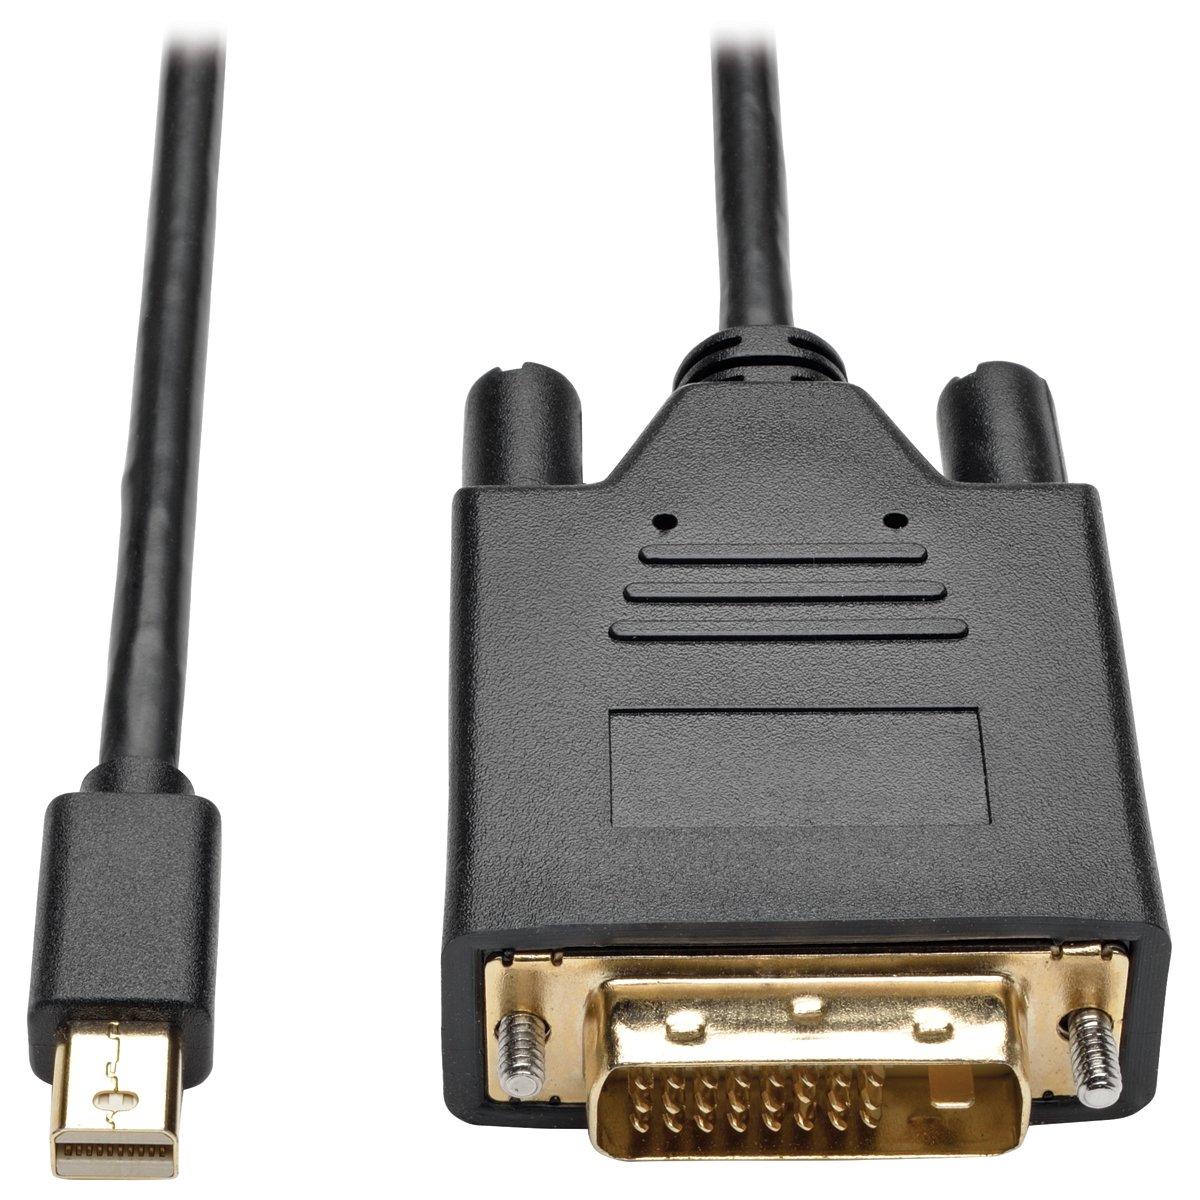 Tripp Lite Mini DisplayPort to DVI Active Adapter, MDP 1.2, MDP to DVI (M/M), MDP2DVI, 1080p, 6 ft. (P586-006-DVI-V2)